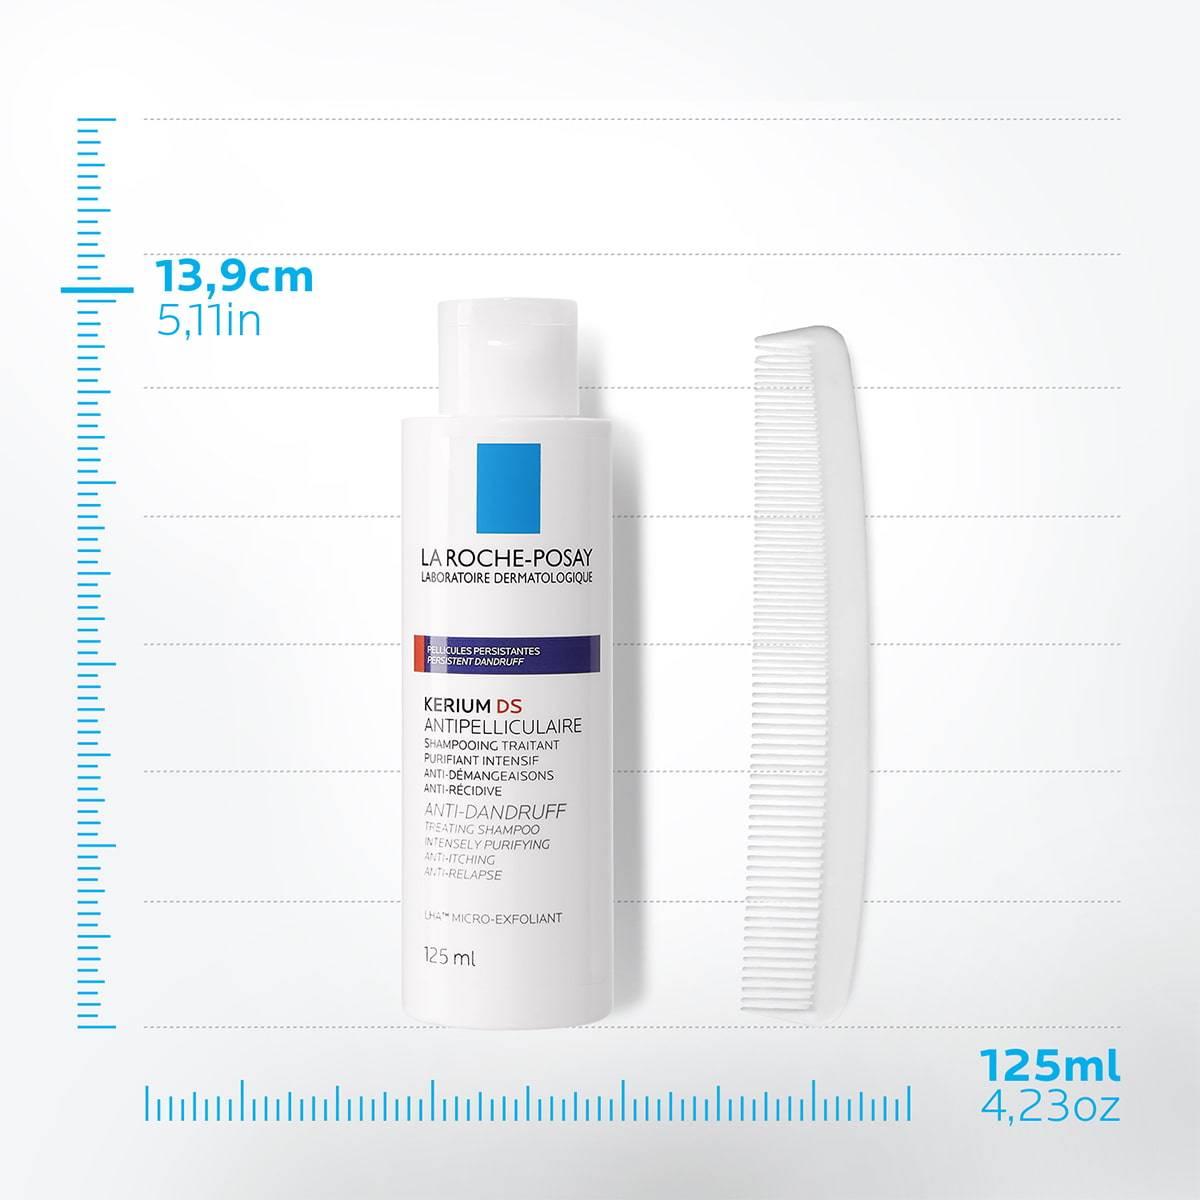 La Roche Posay ProductPage Kerium DS Anti Dandruff Treating Shampoo 12